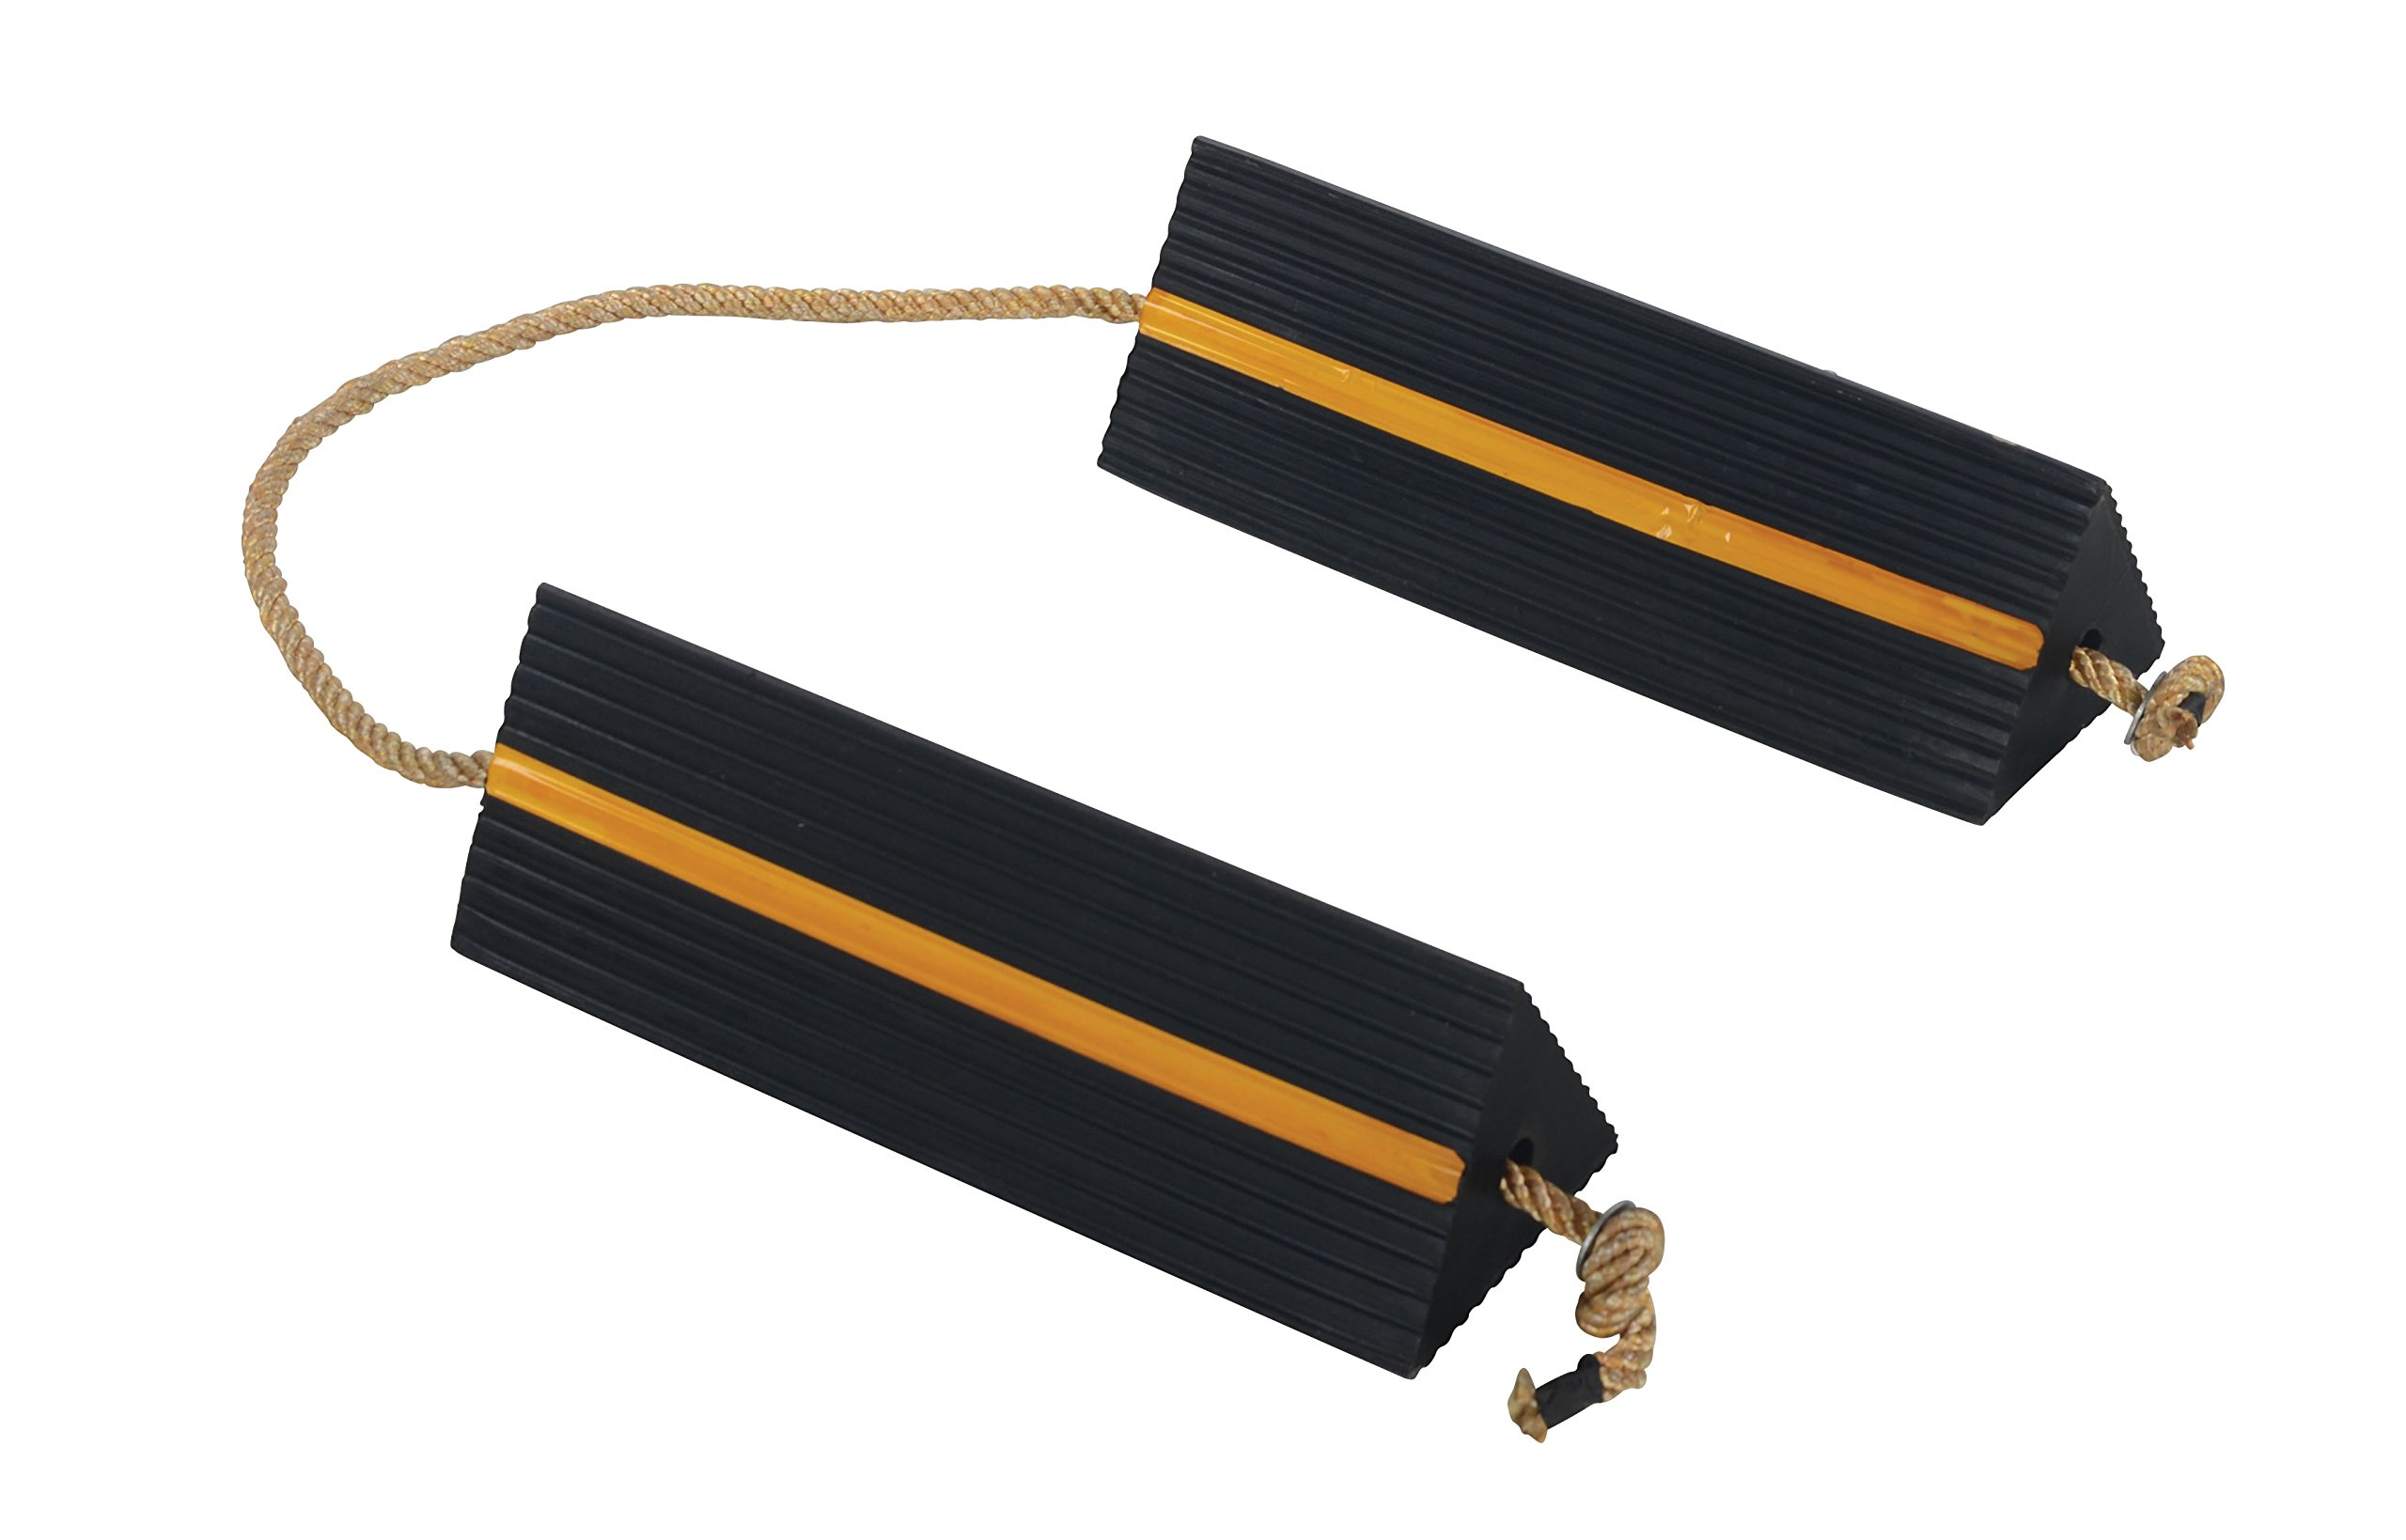 Vestil AC-18 Wheel Chock with Rope, 18'' Width x 5-1/2'' Height x 6'' Depth